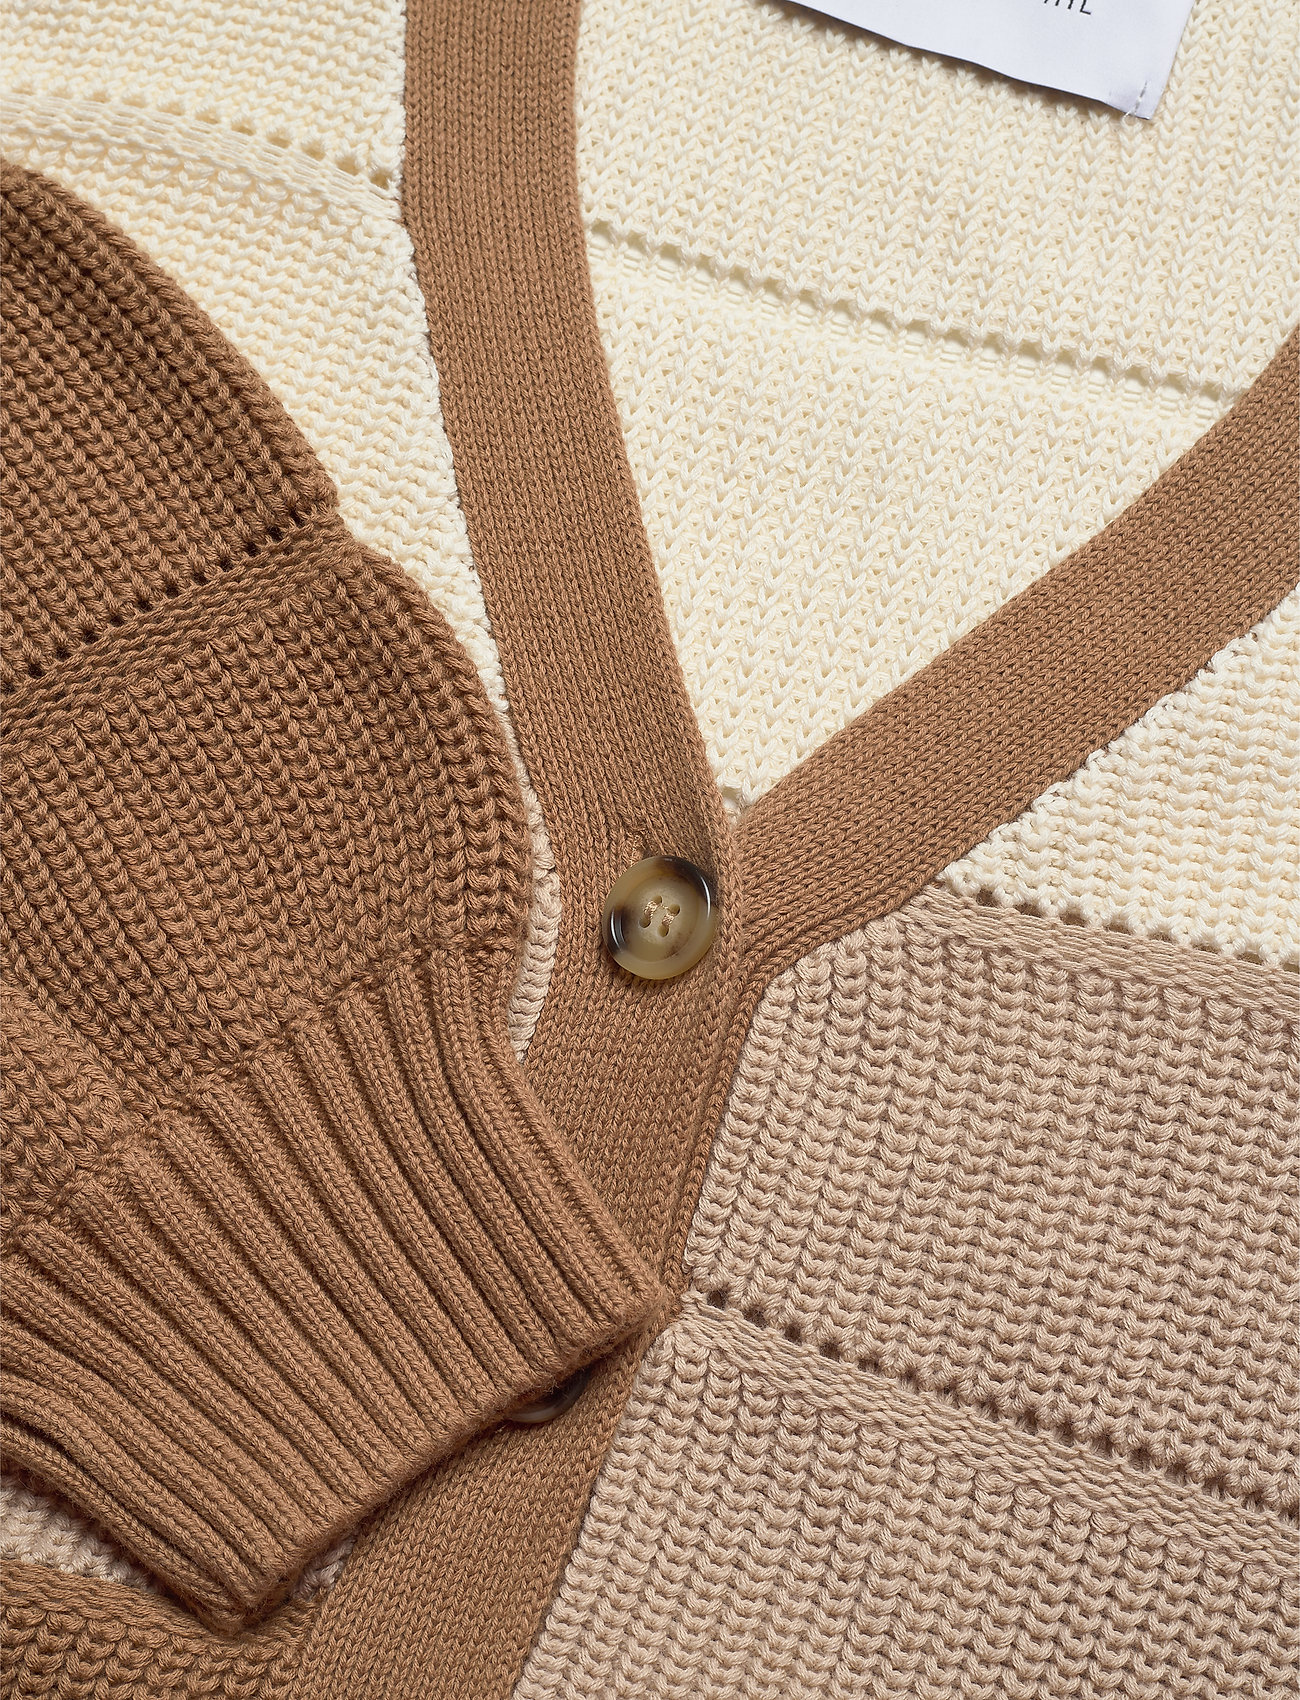 Precise Blocked Cardigan (Sand) (1019.40 kr) - Camilla Pihl